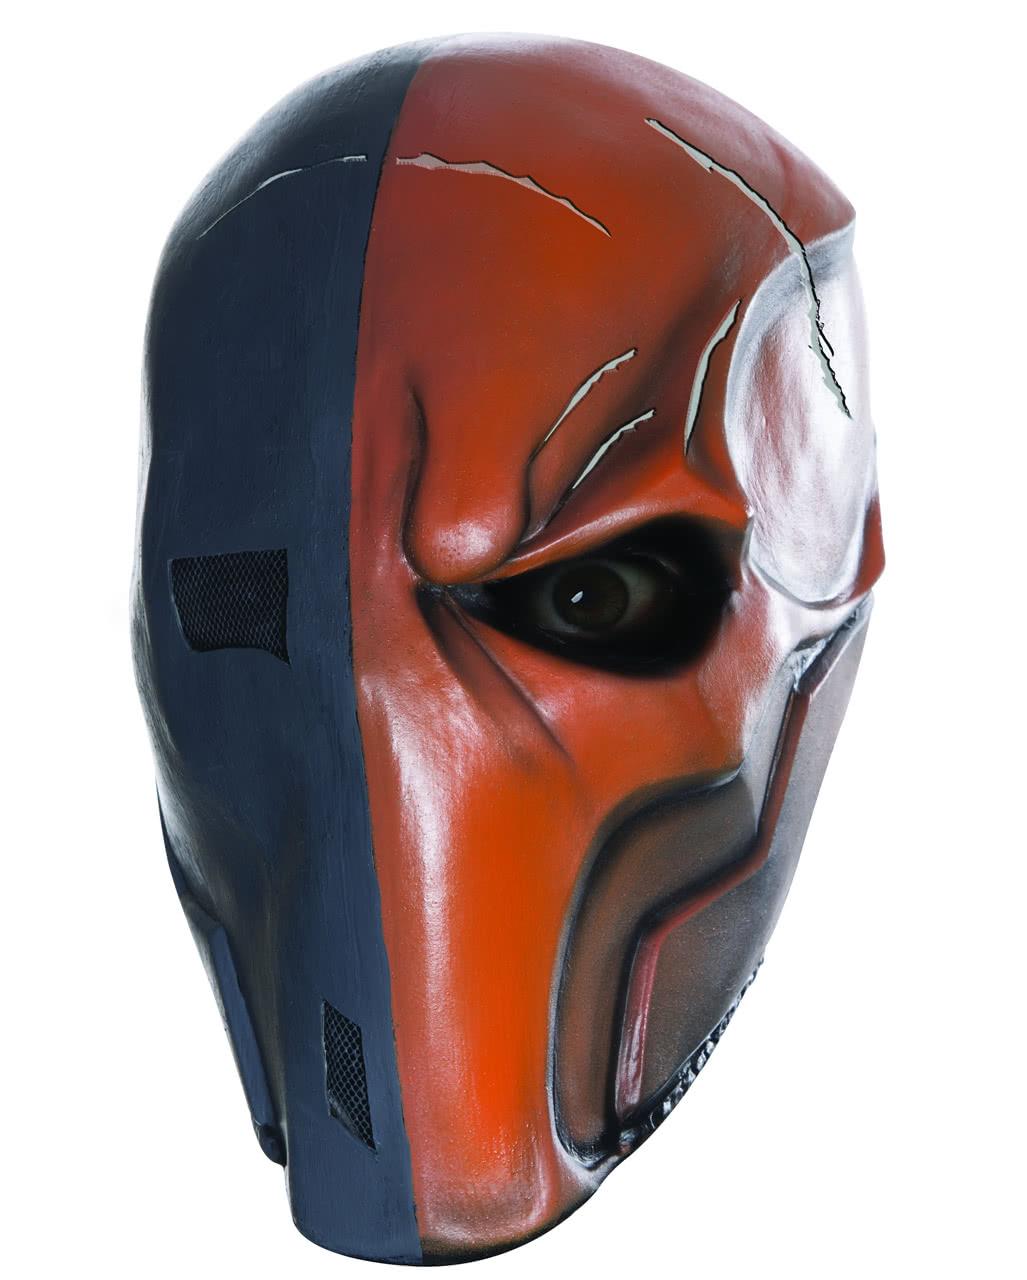 Deathstroke 3/4 Maske für Karnevalskostüme